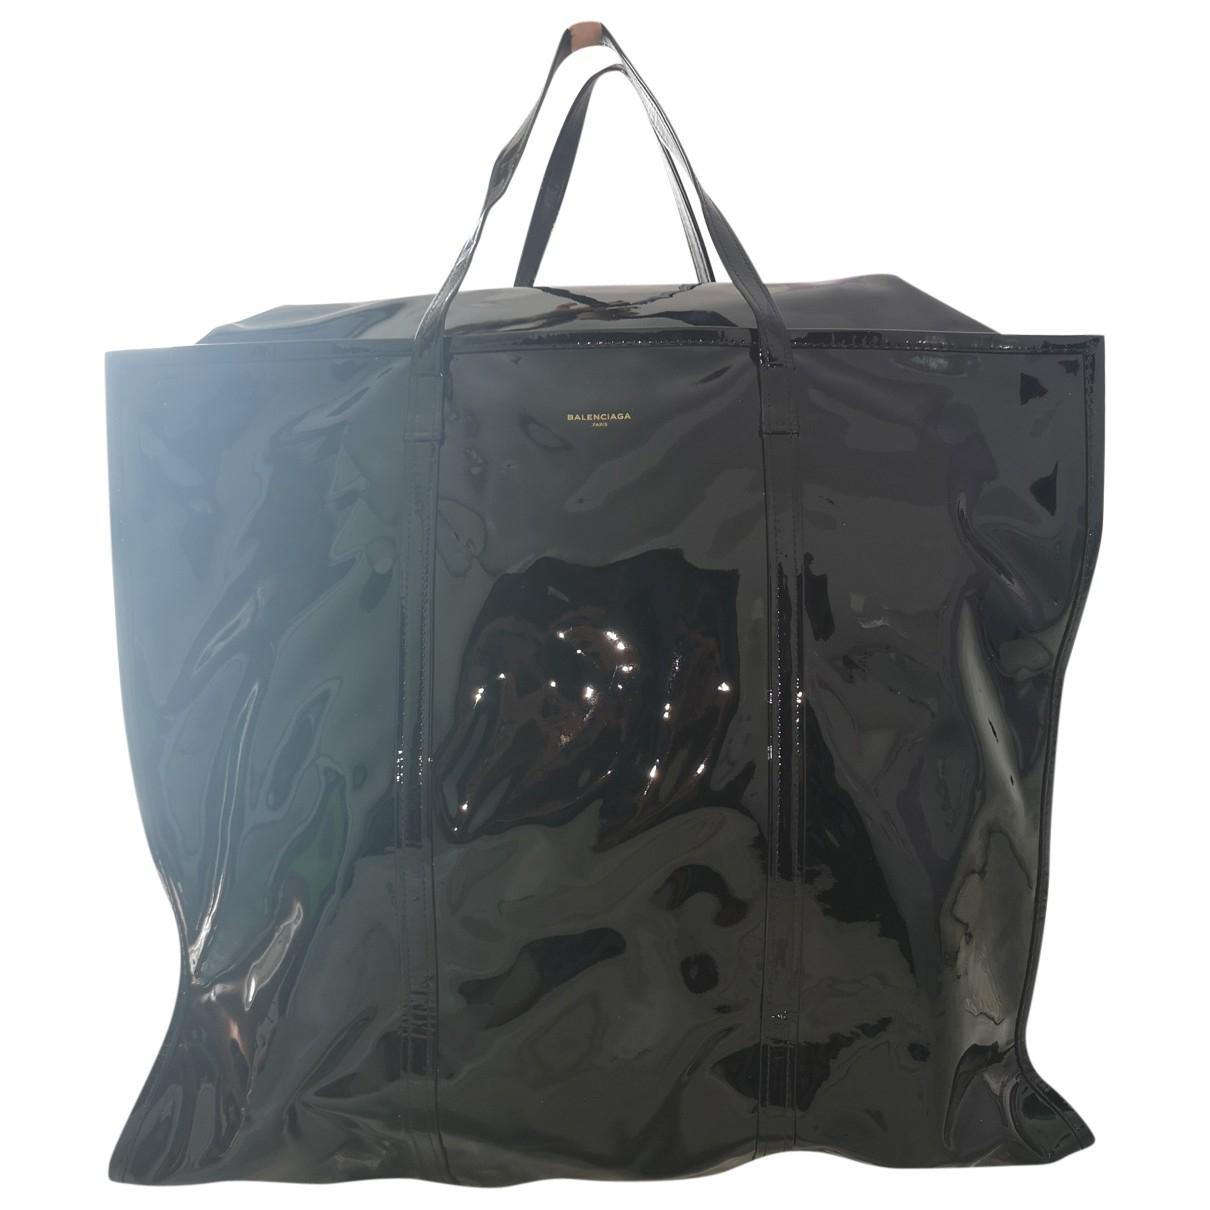 Balenciaga - Sac a main Bazar Bag pour femme en cuir verni - noir